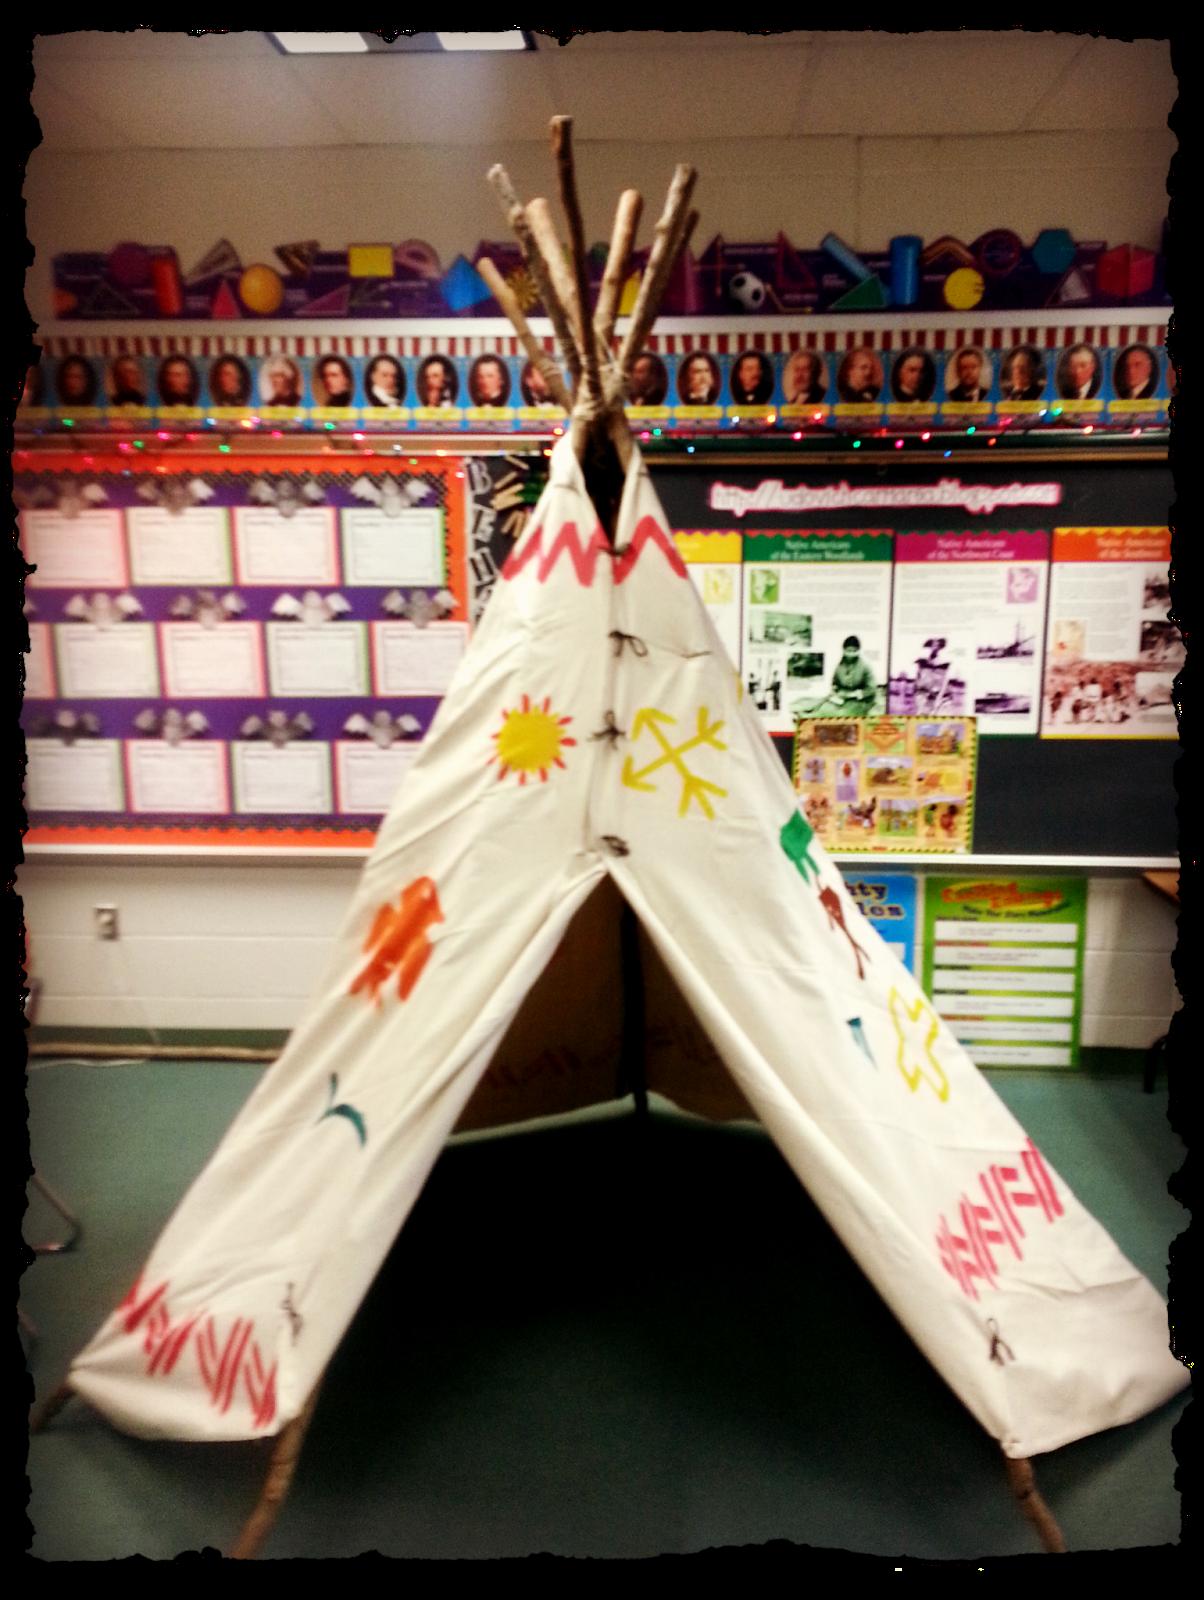 American Indian boarding schools - Wikipedia